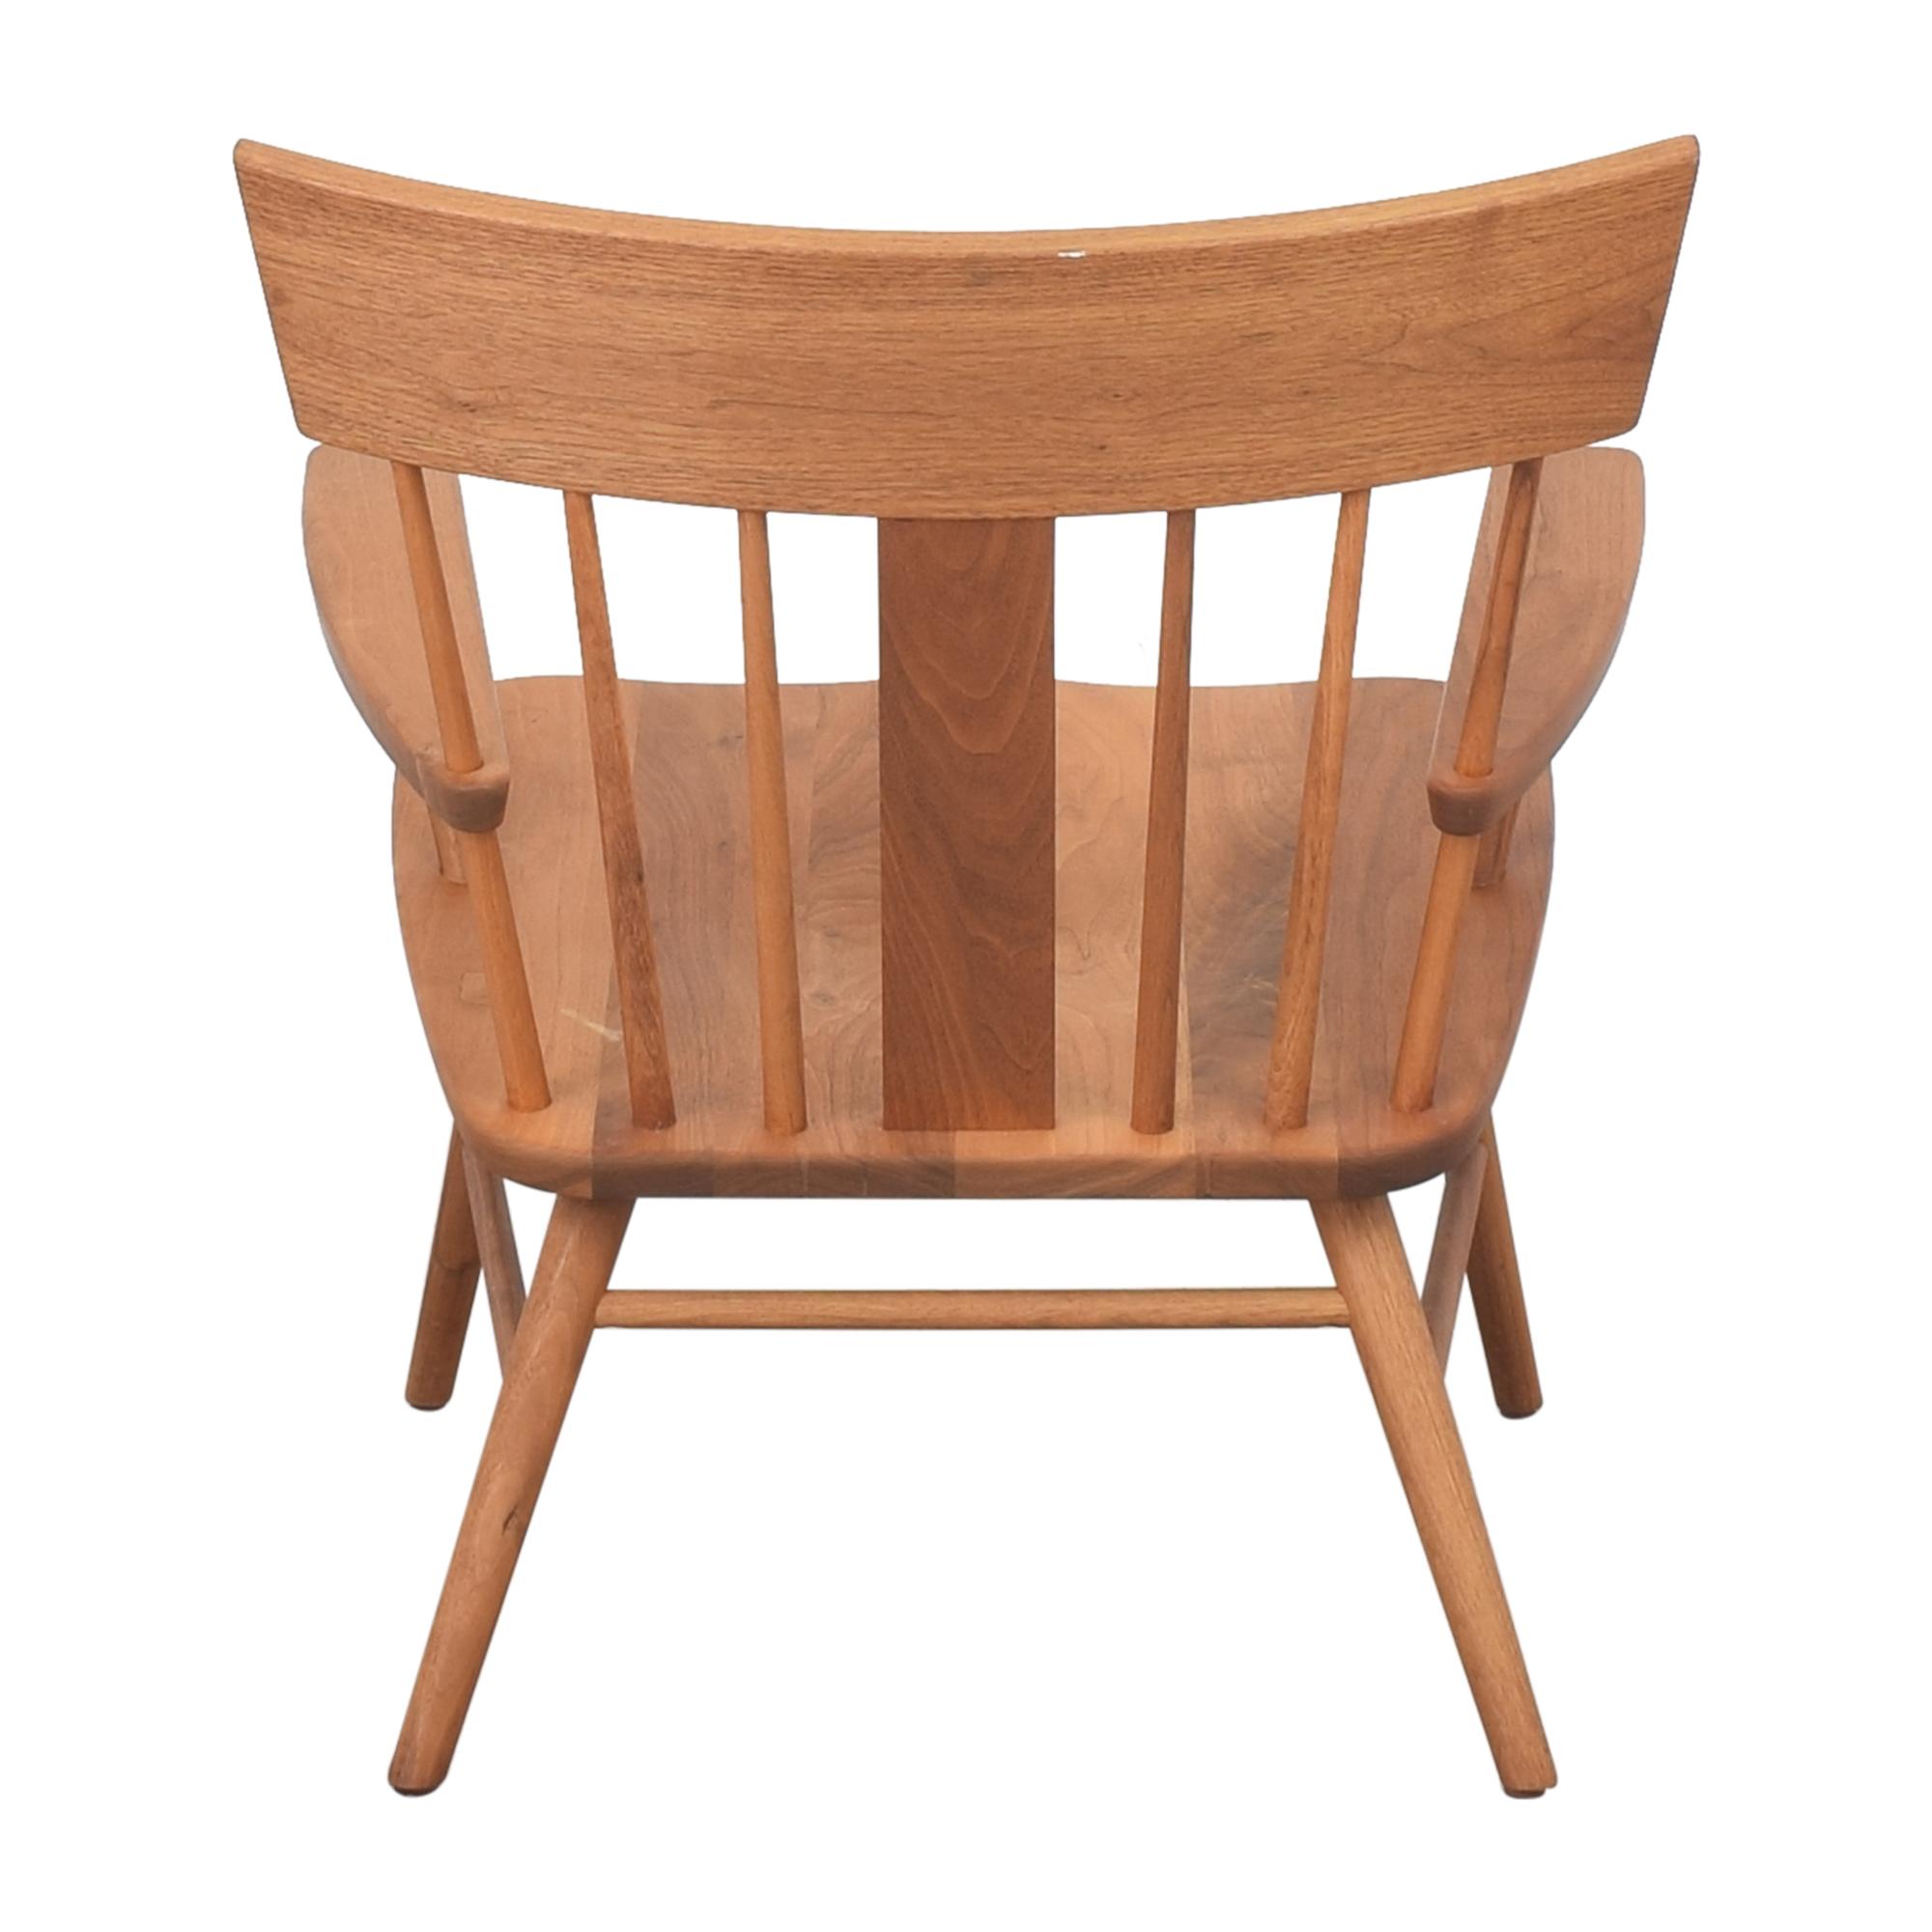 Room & Board Room & Board Sandberg Chair pa